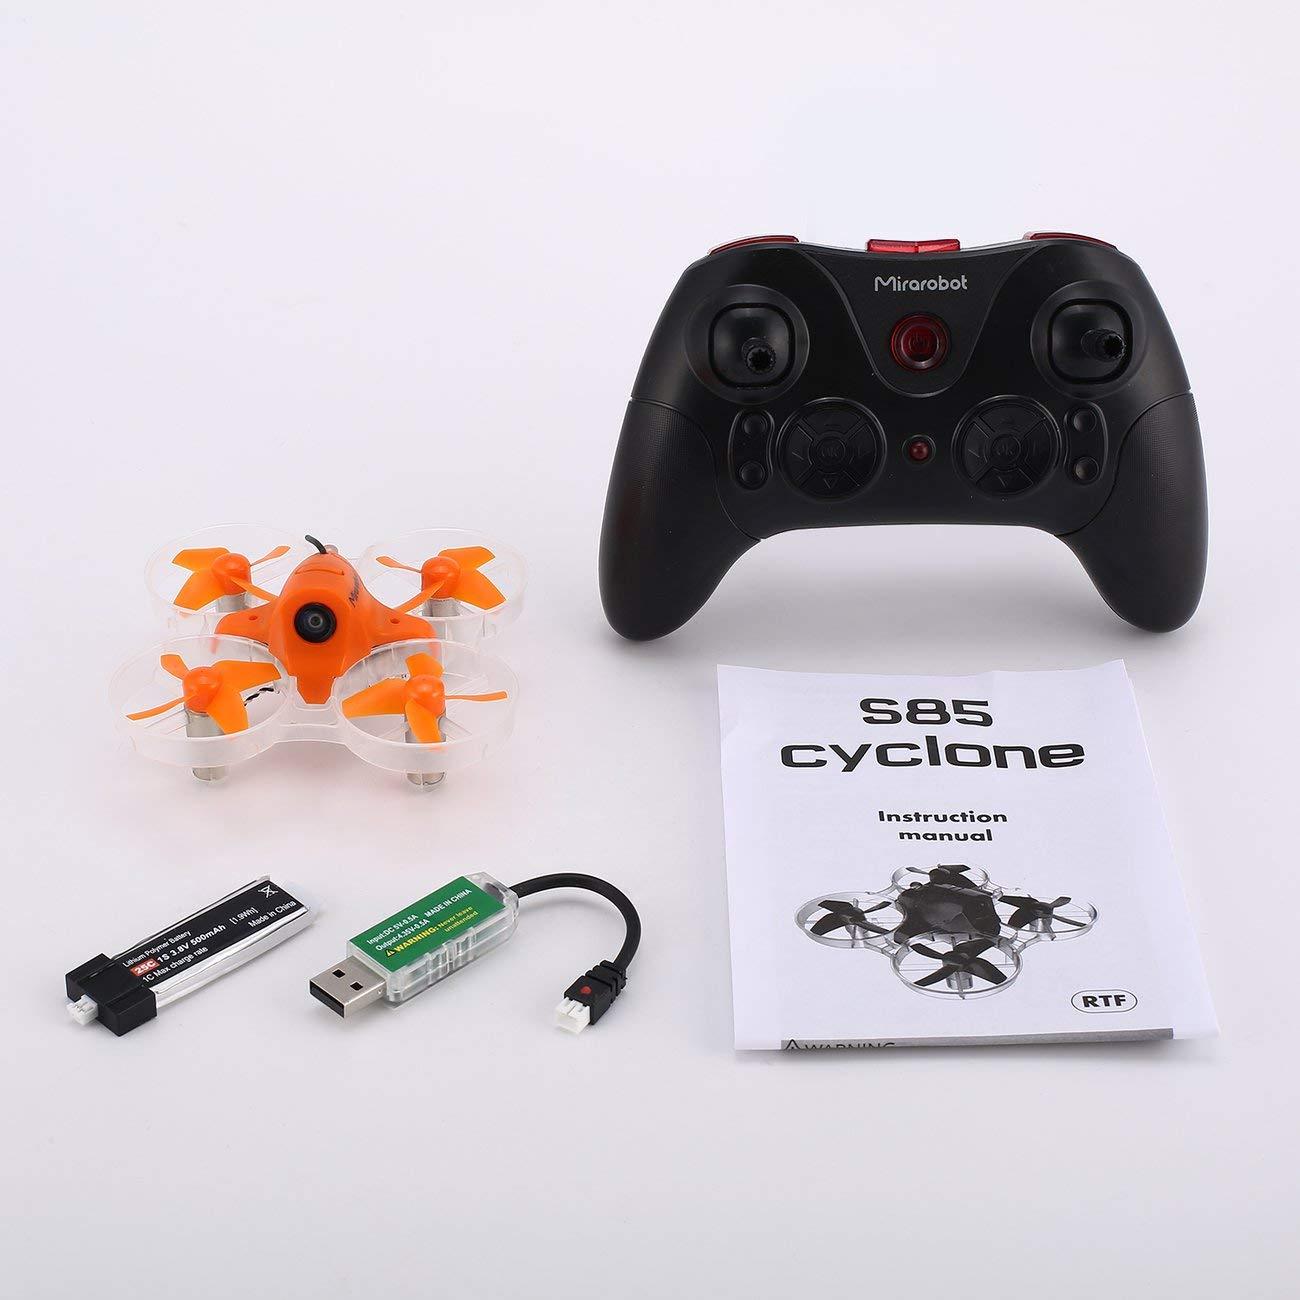 Mirarobot S85 5,8 G 25 mW 600TVL Kamera Tiny Micro Innen FPV RC Racing Drone